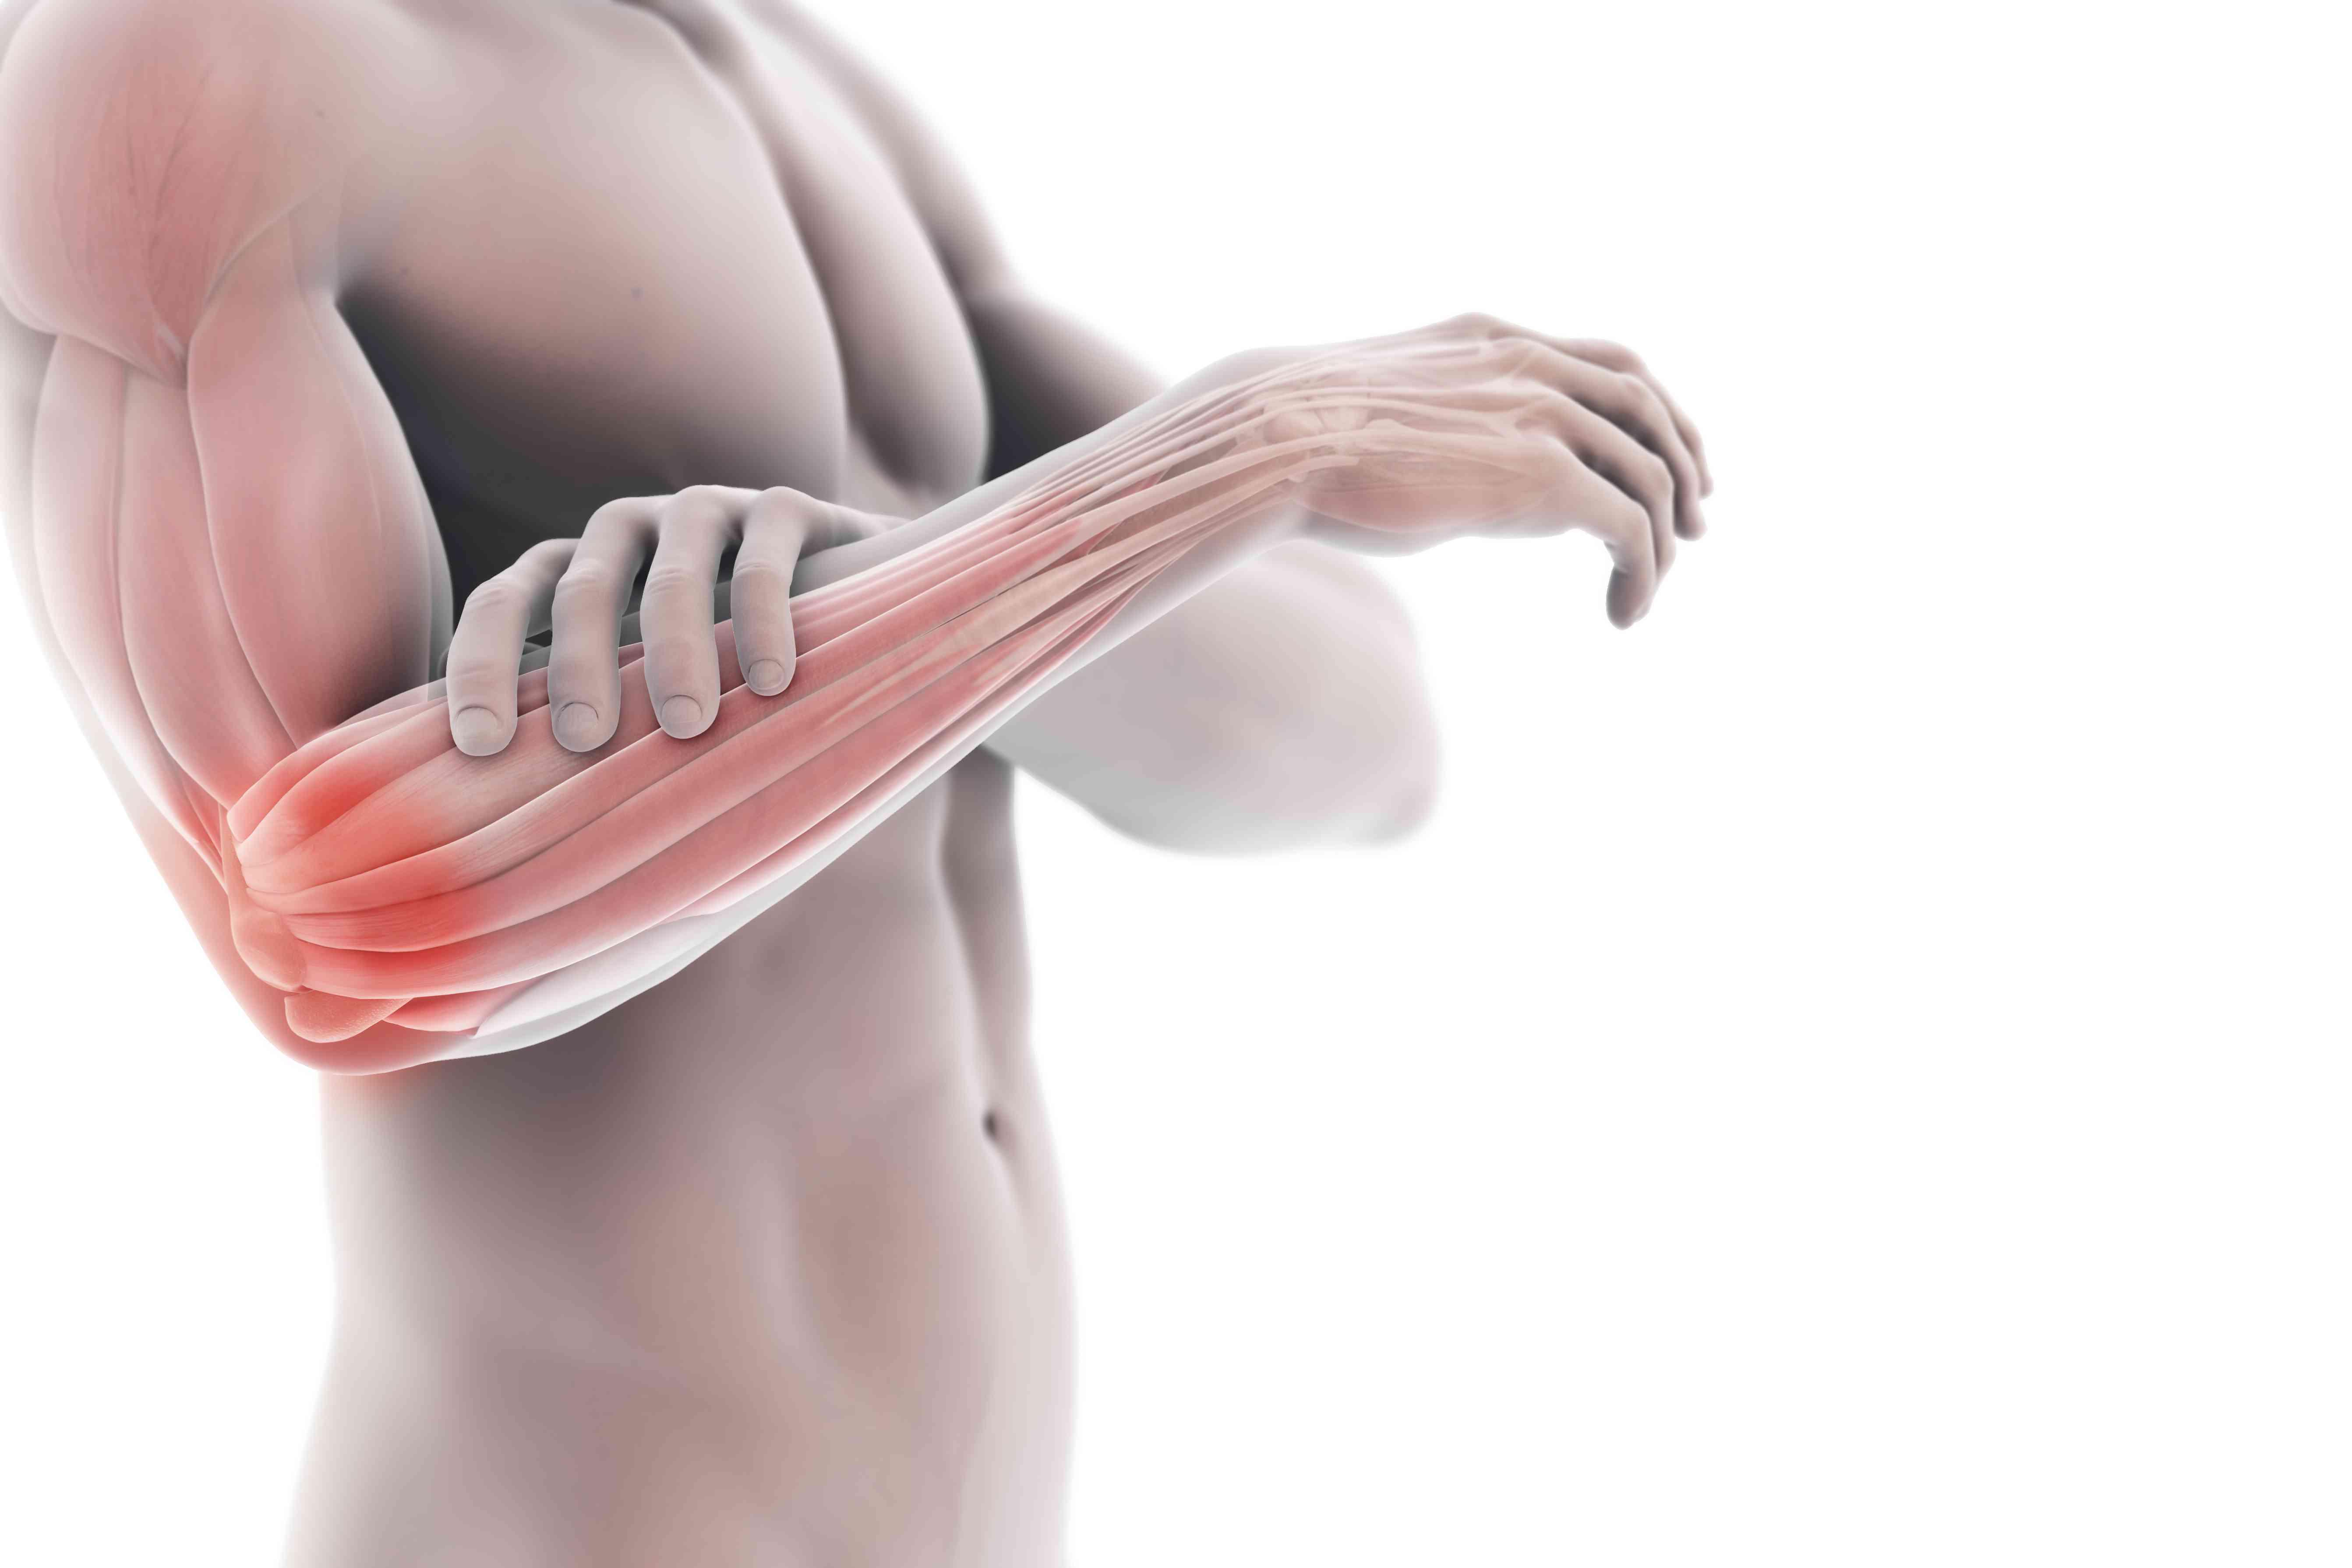 Illustration showing tennis elbow